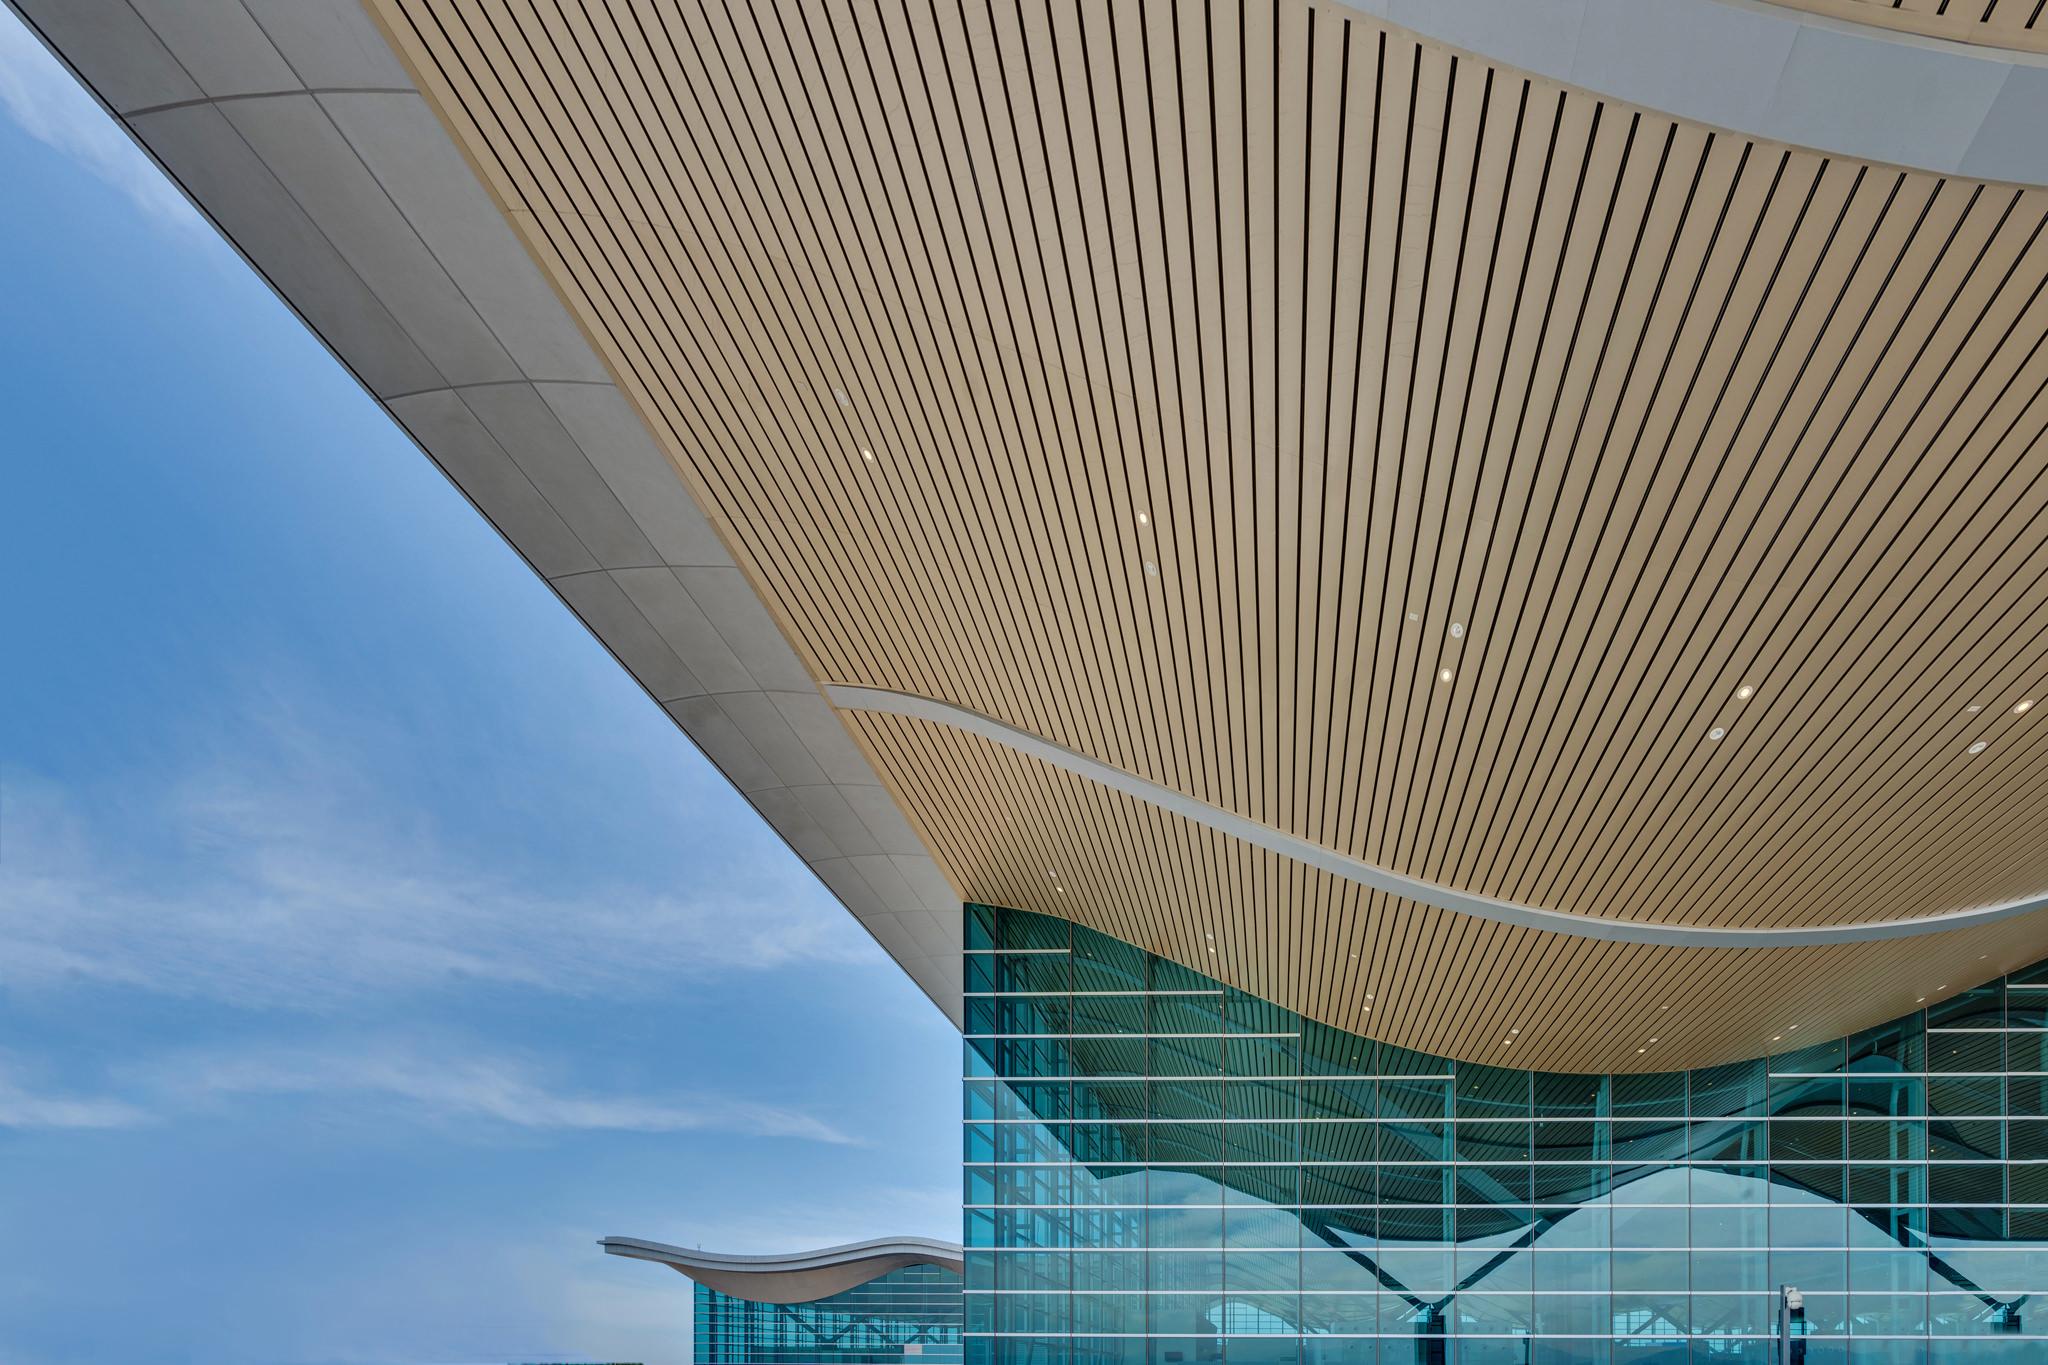 20180626 - Cam Ranh Airport - Architecture - 0295.jpg